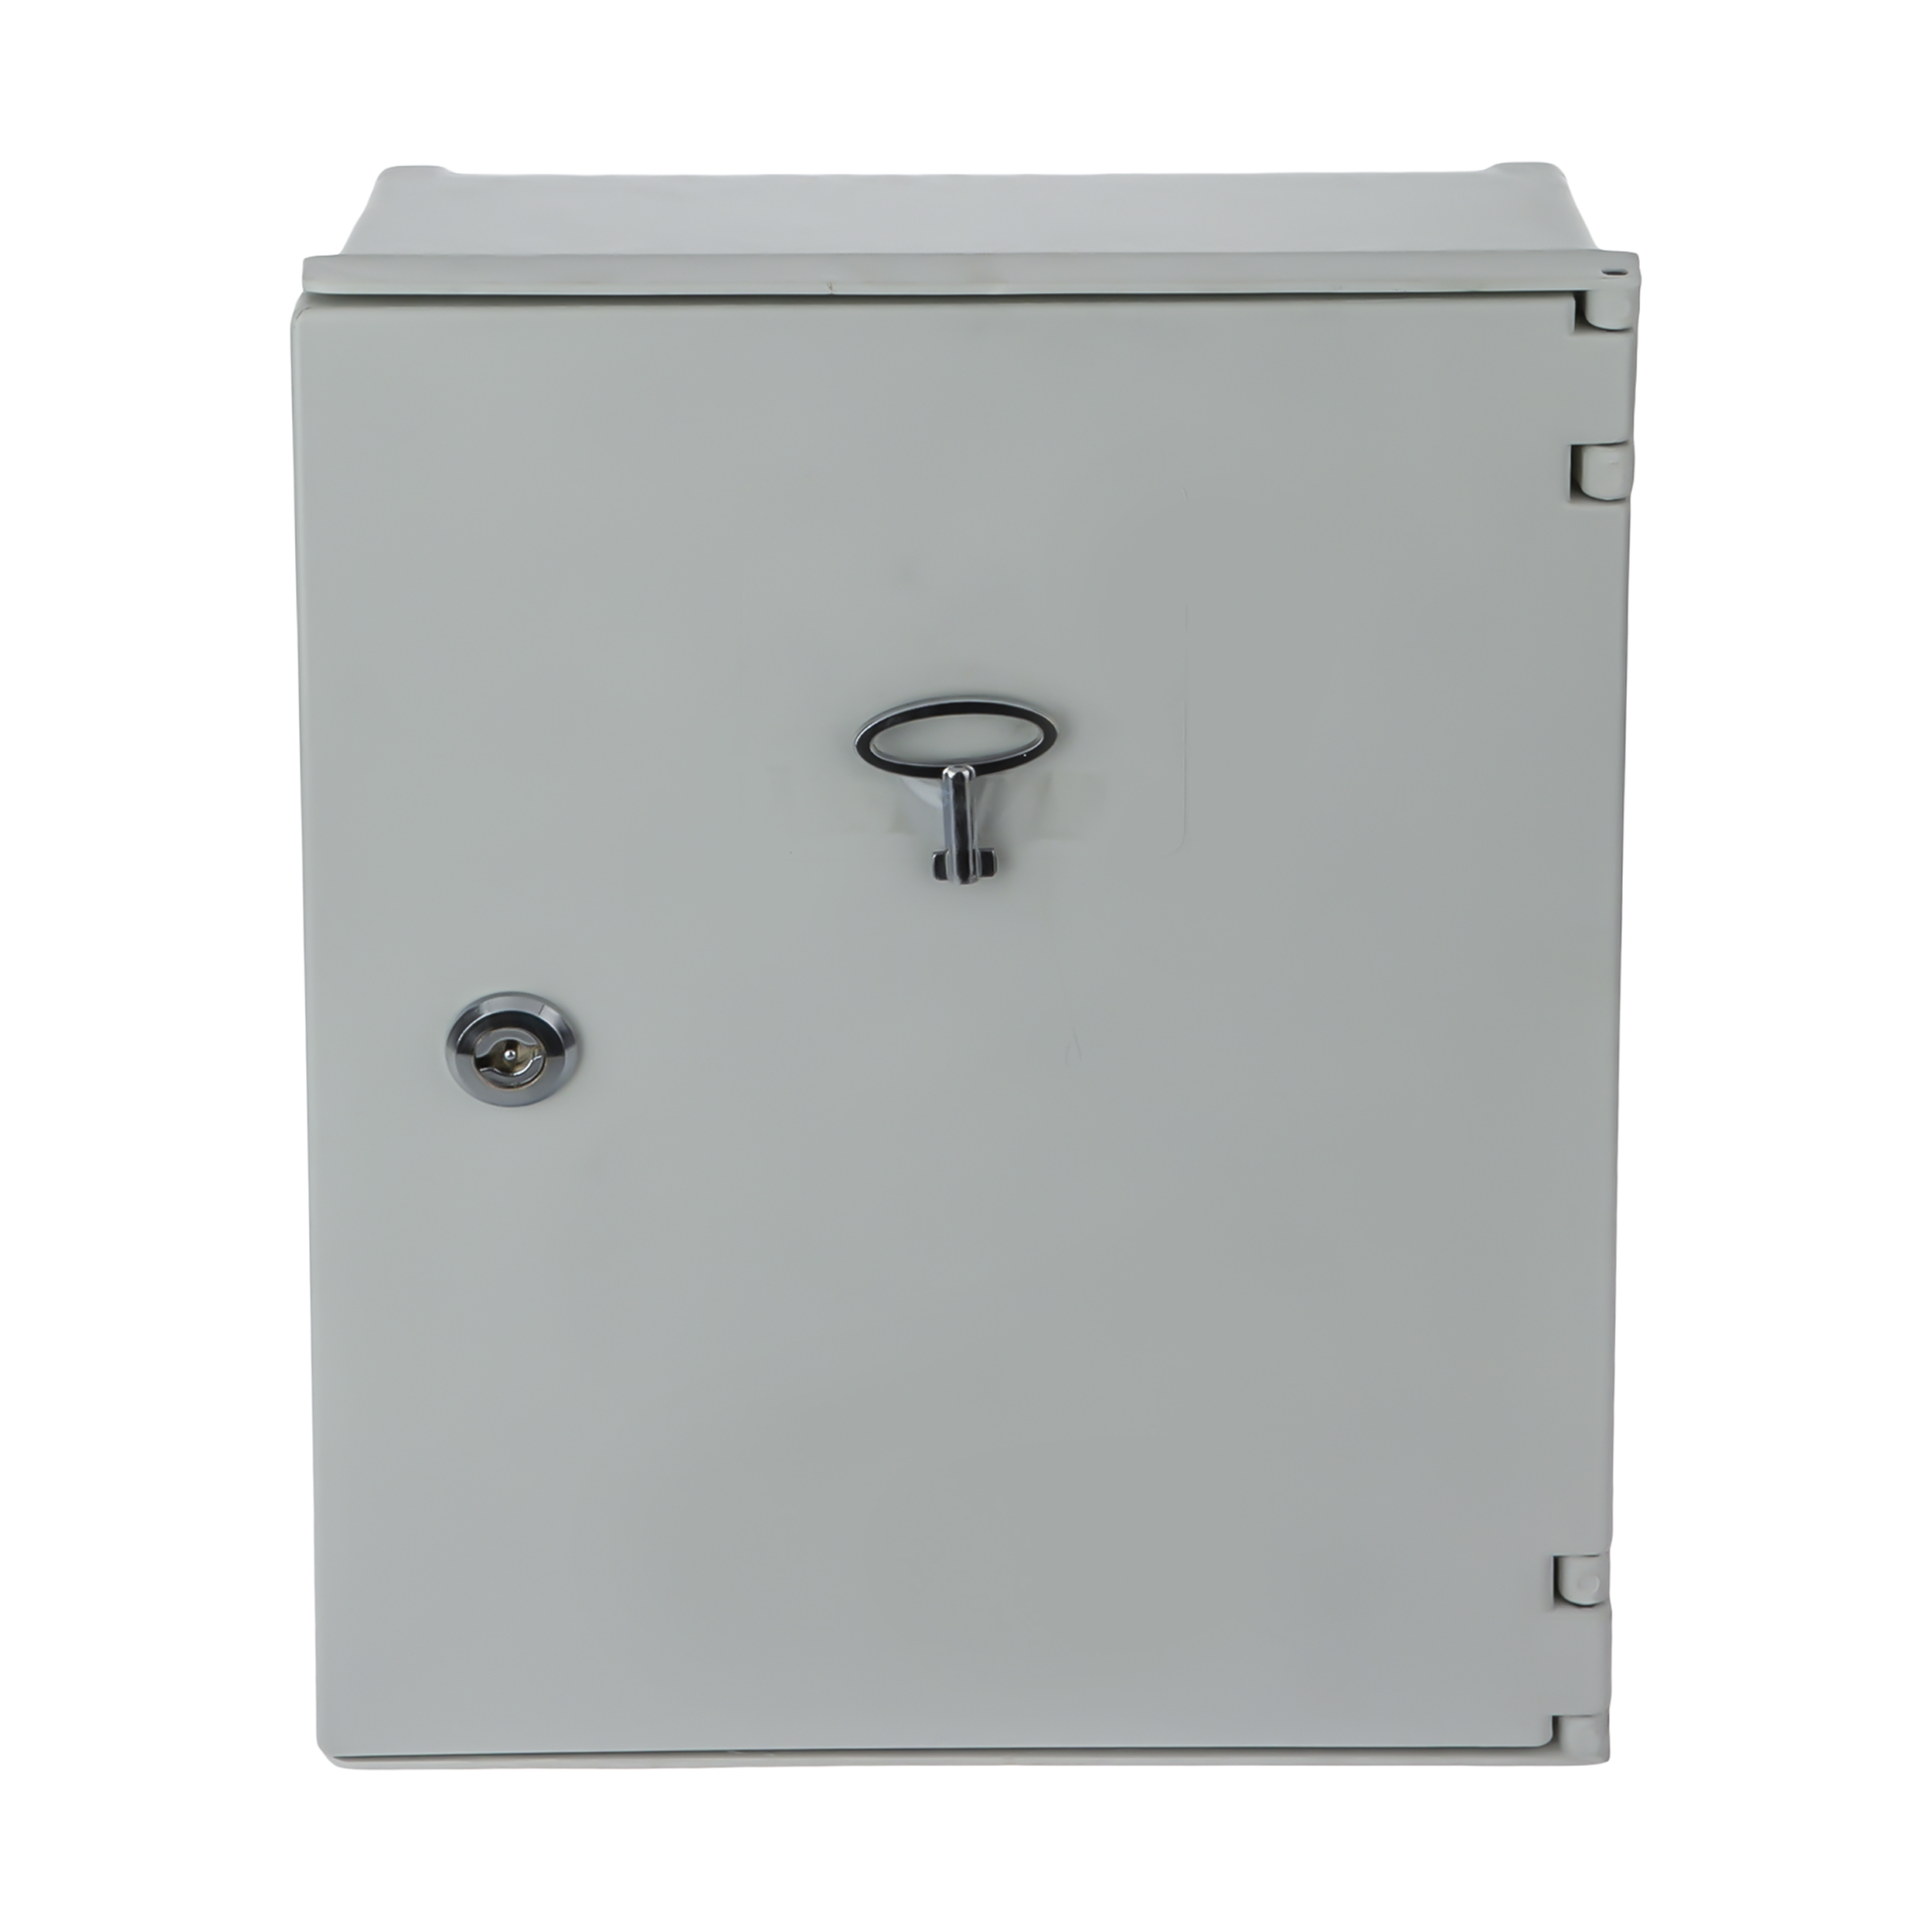 تابلو برق آروین صنعت بسپار کد 011